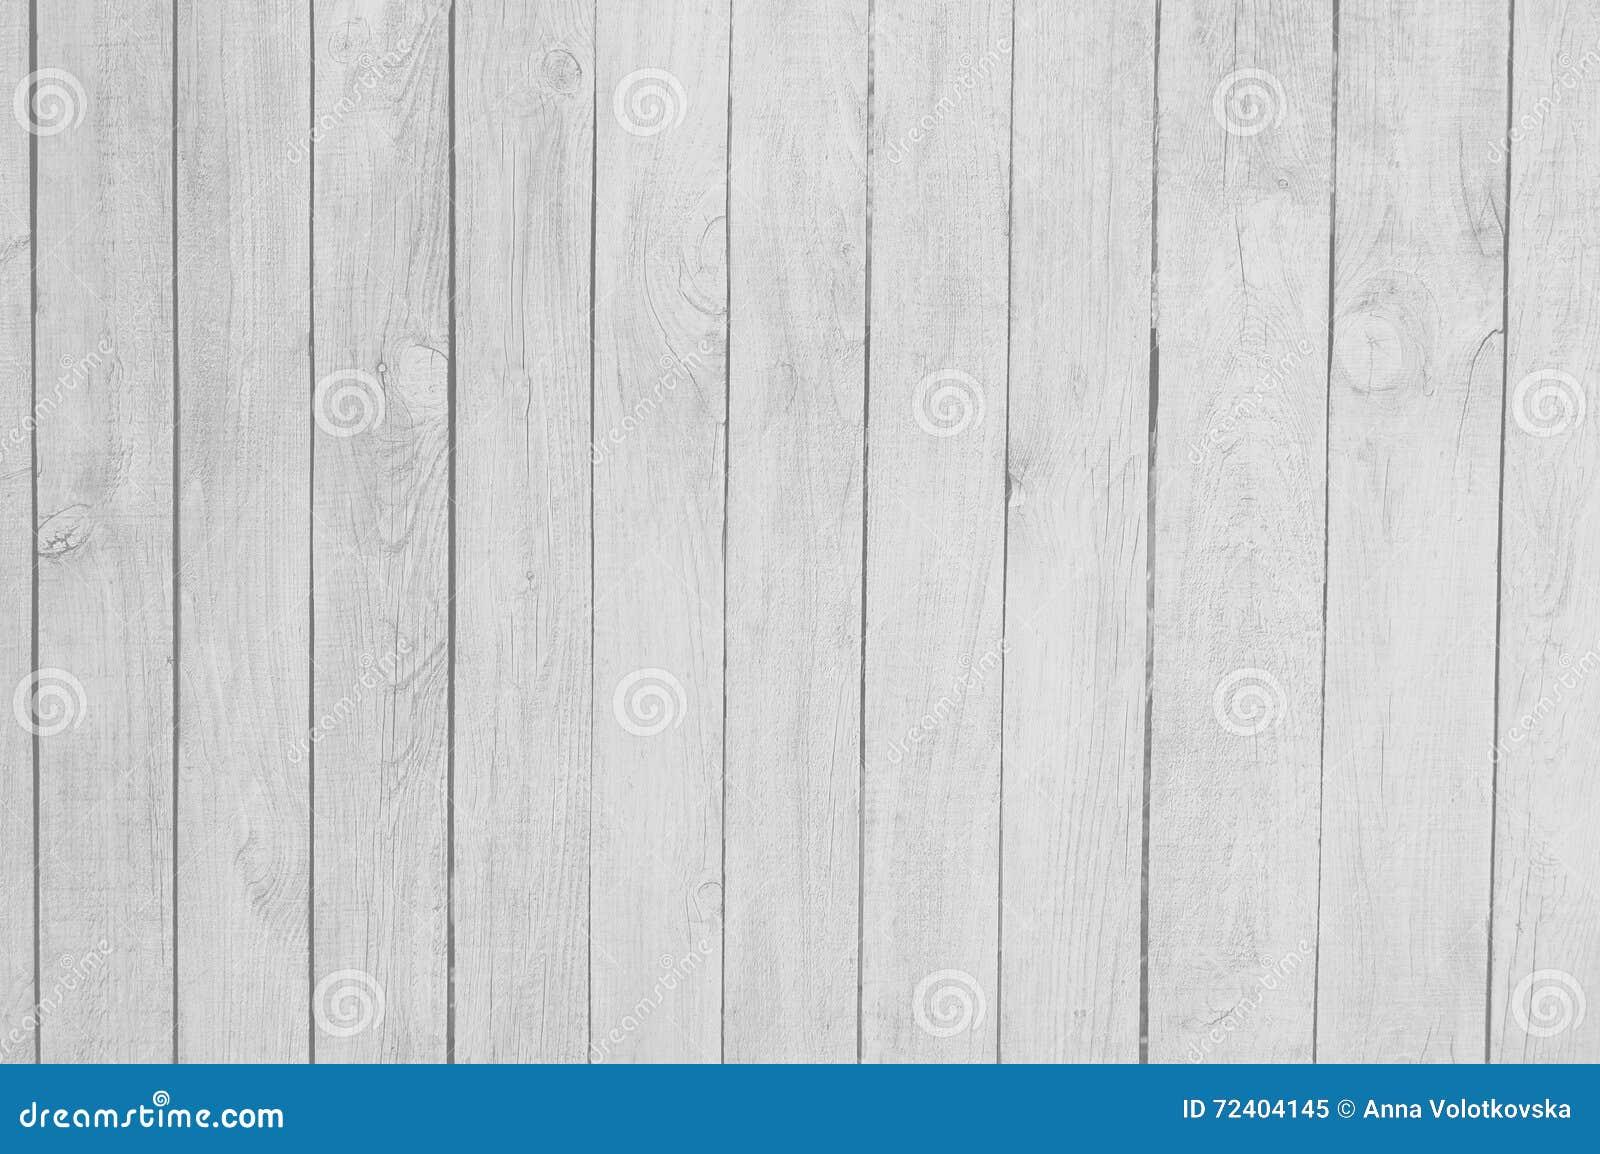 Close Up Of White Wooden Fence Panels. Stock Image - Image ...